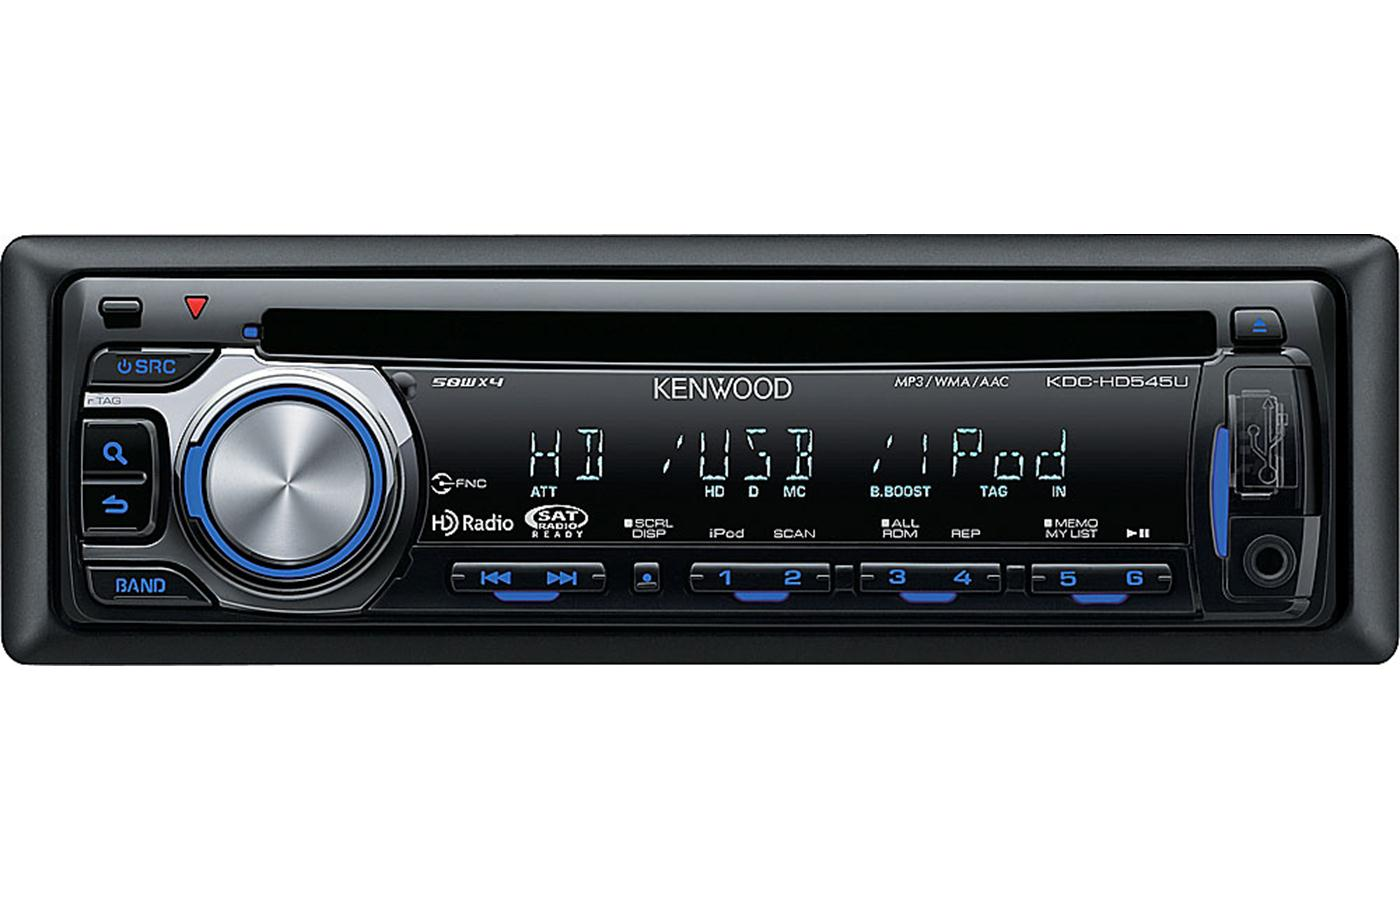 Kenwood Kdc 248u User Manual Model 152 Wiring Diagram Excelon X599 Car Audio Kansas City Rh Maxspeedandsound Com